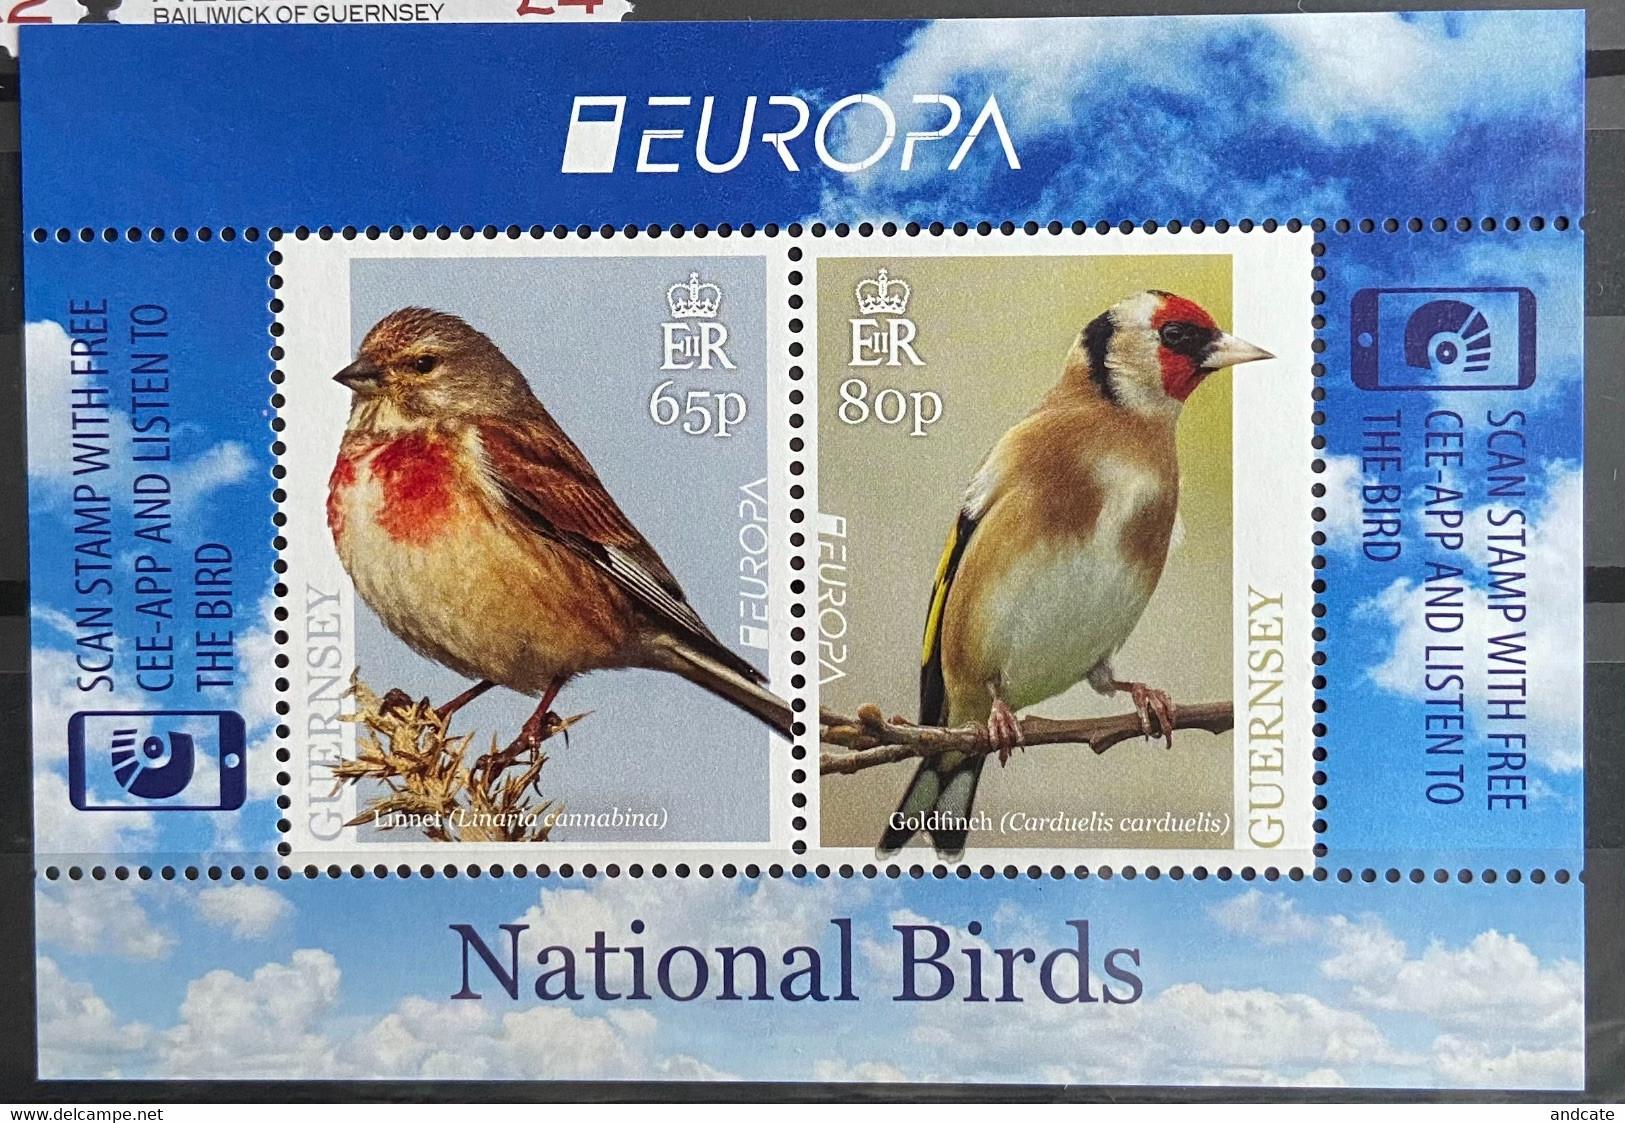 Guernsey 2019 MNH - Europa , National Birds - Guernsey